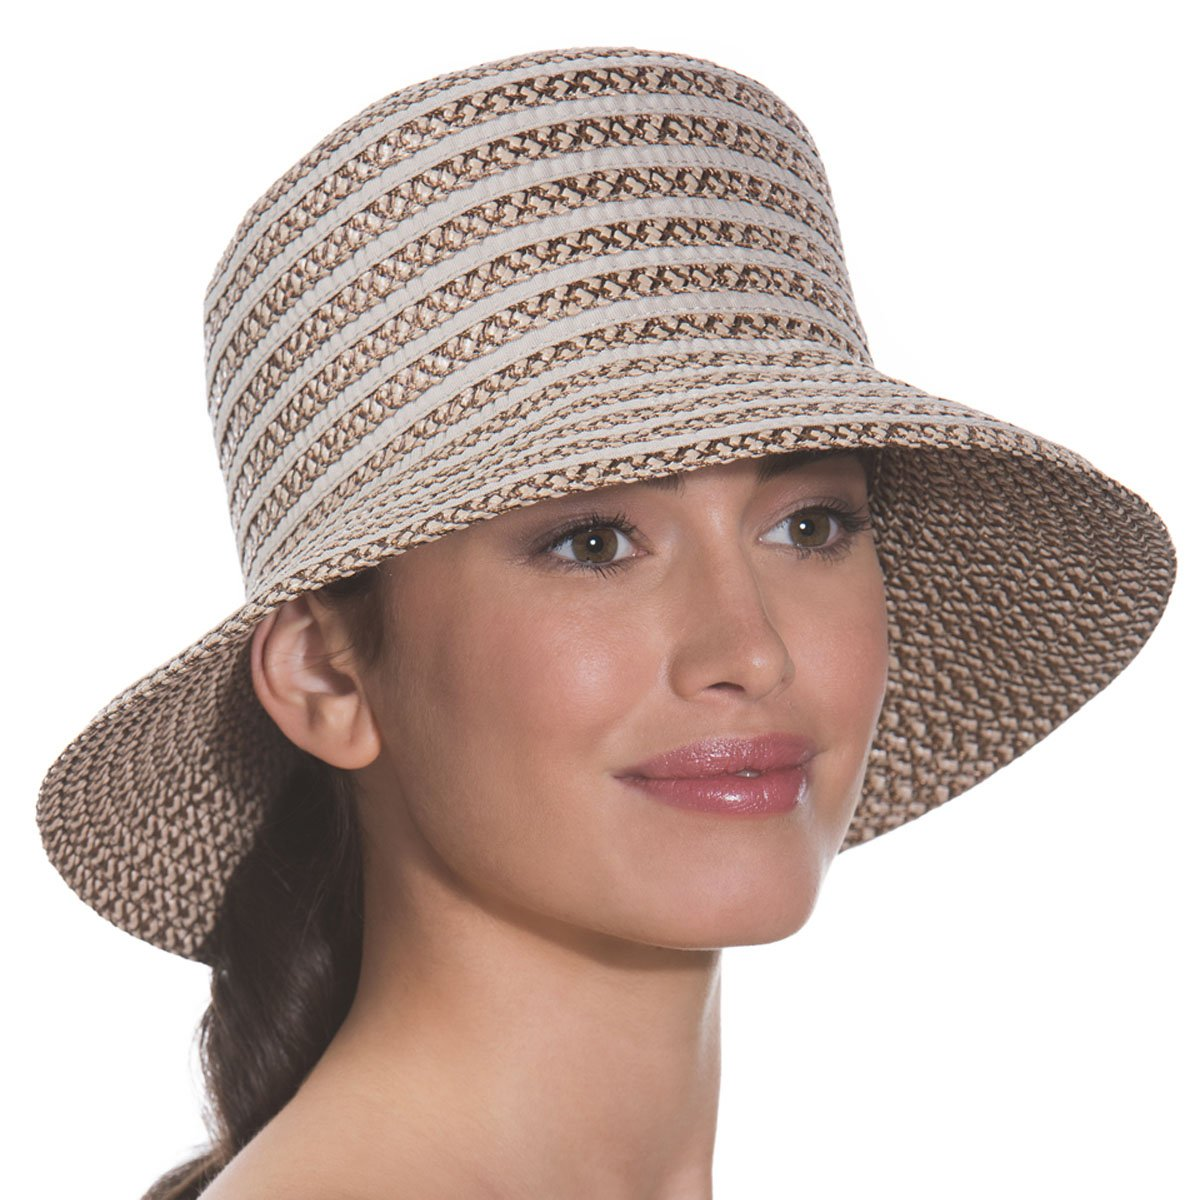 Eric Javits Luxury Fashion Designer Women's Headwear Hat - Braid Dame - Bark